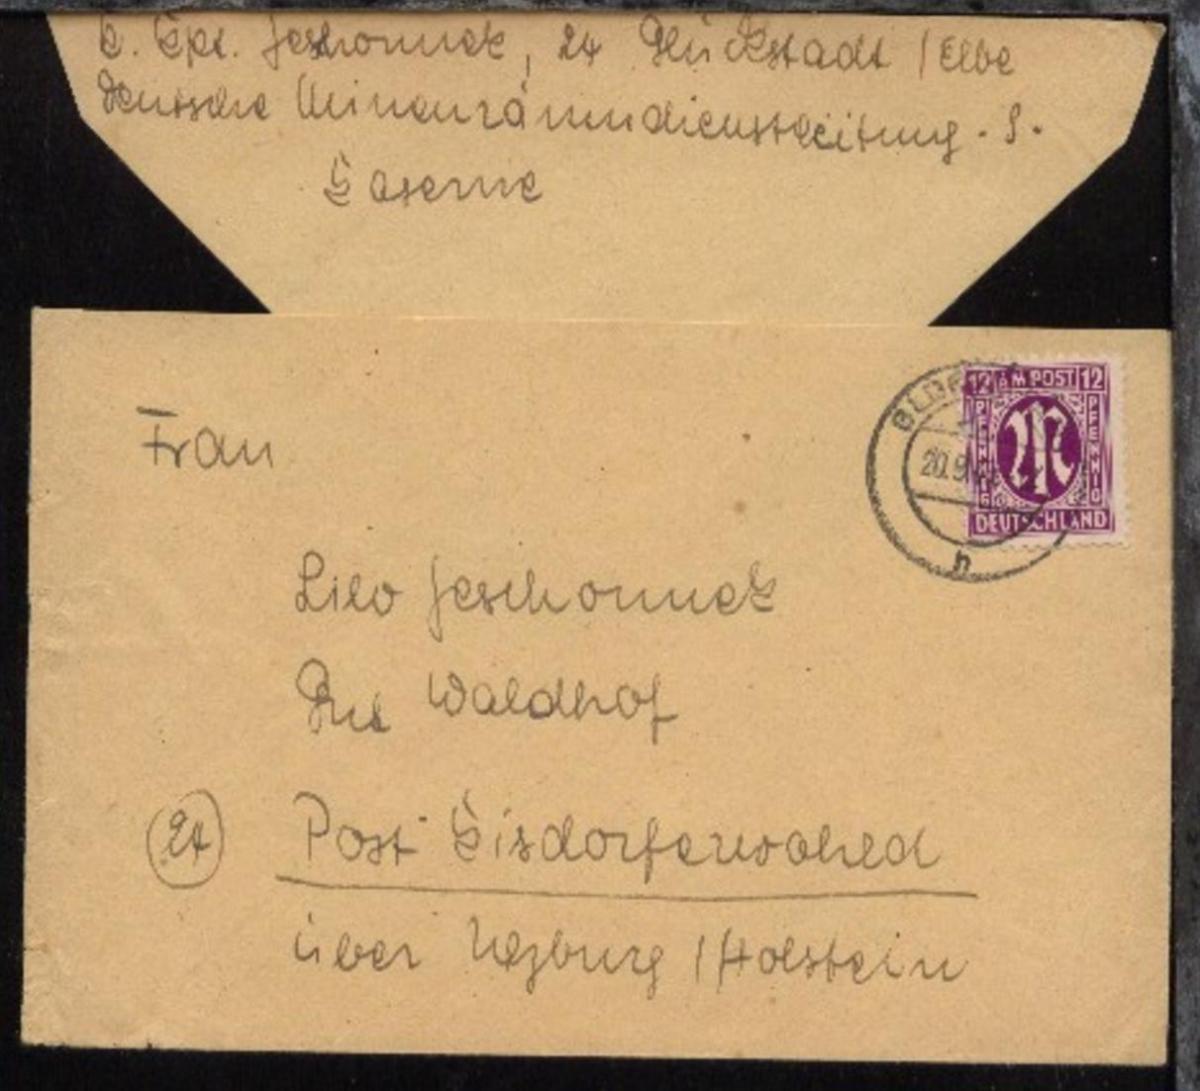 OSt. Glückstadt 20.9.45 auf Bf., Abs.-Ang. K. Kpt. Geschonneck Glückstadt 0